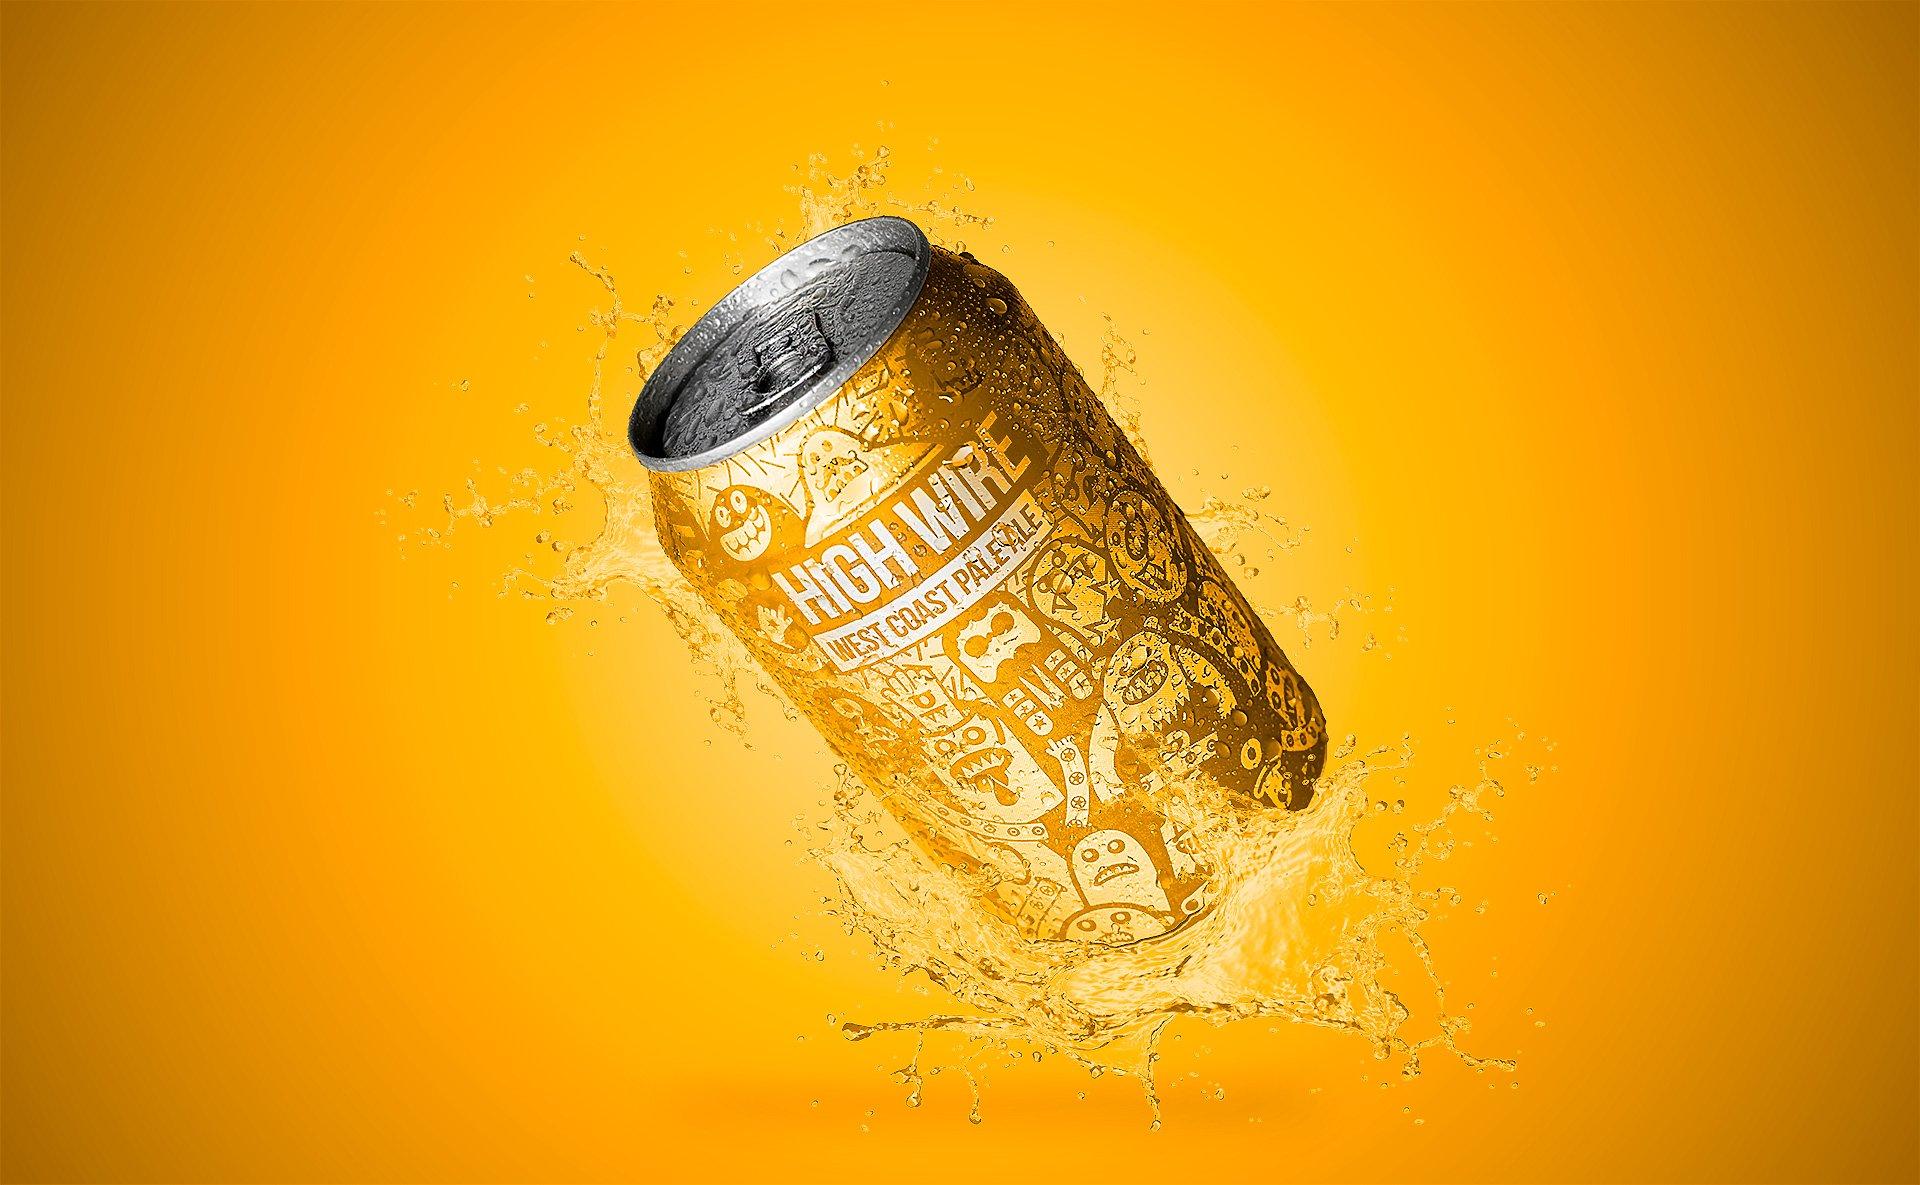 A craft beer can splashing.